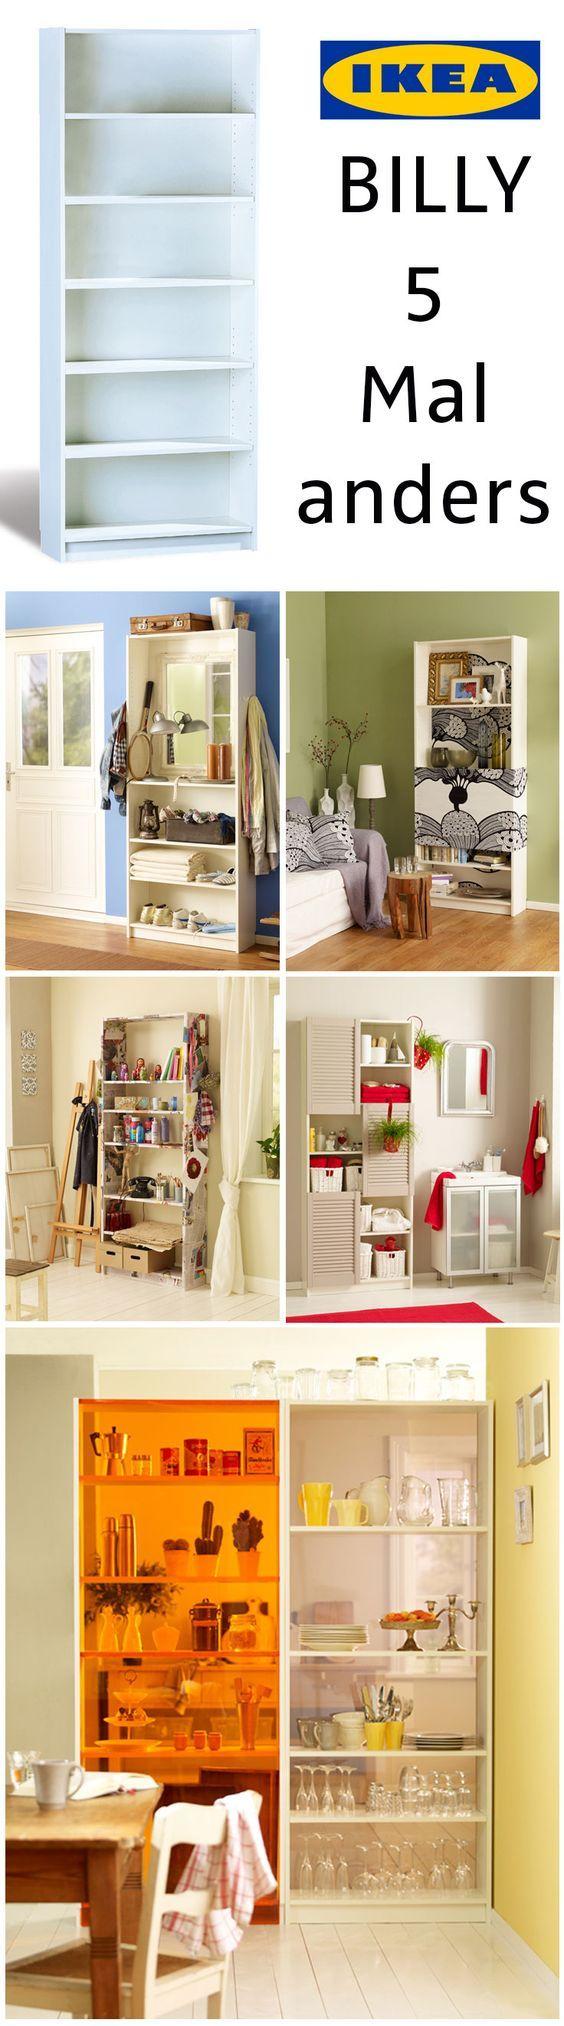 billy regal ohne r ckwand bad pinterest m bel regal und billy regal. Black Bedroom Furniture Sets. Home Design Ideas